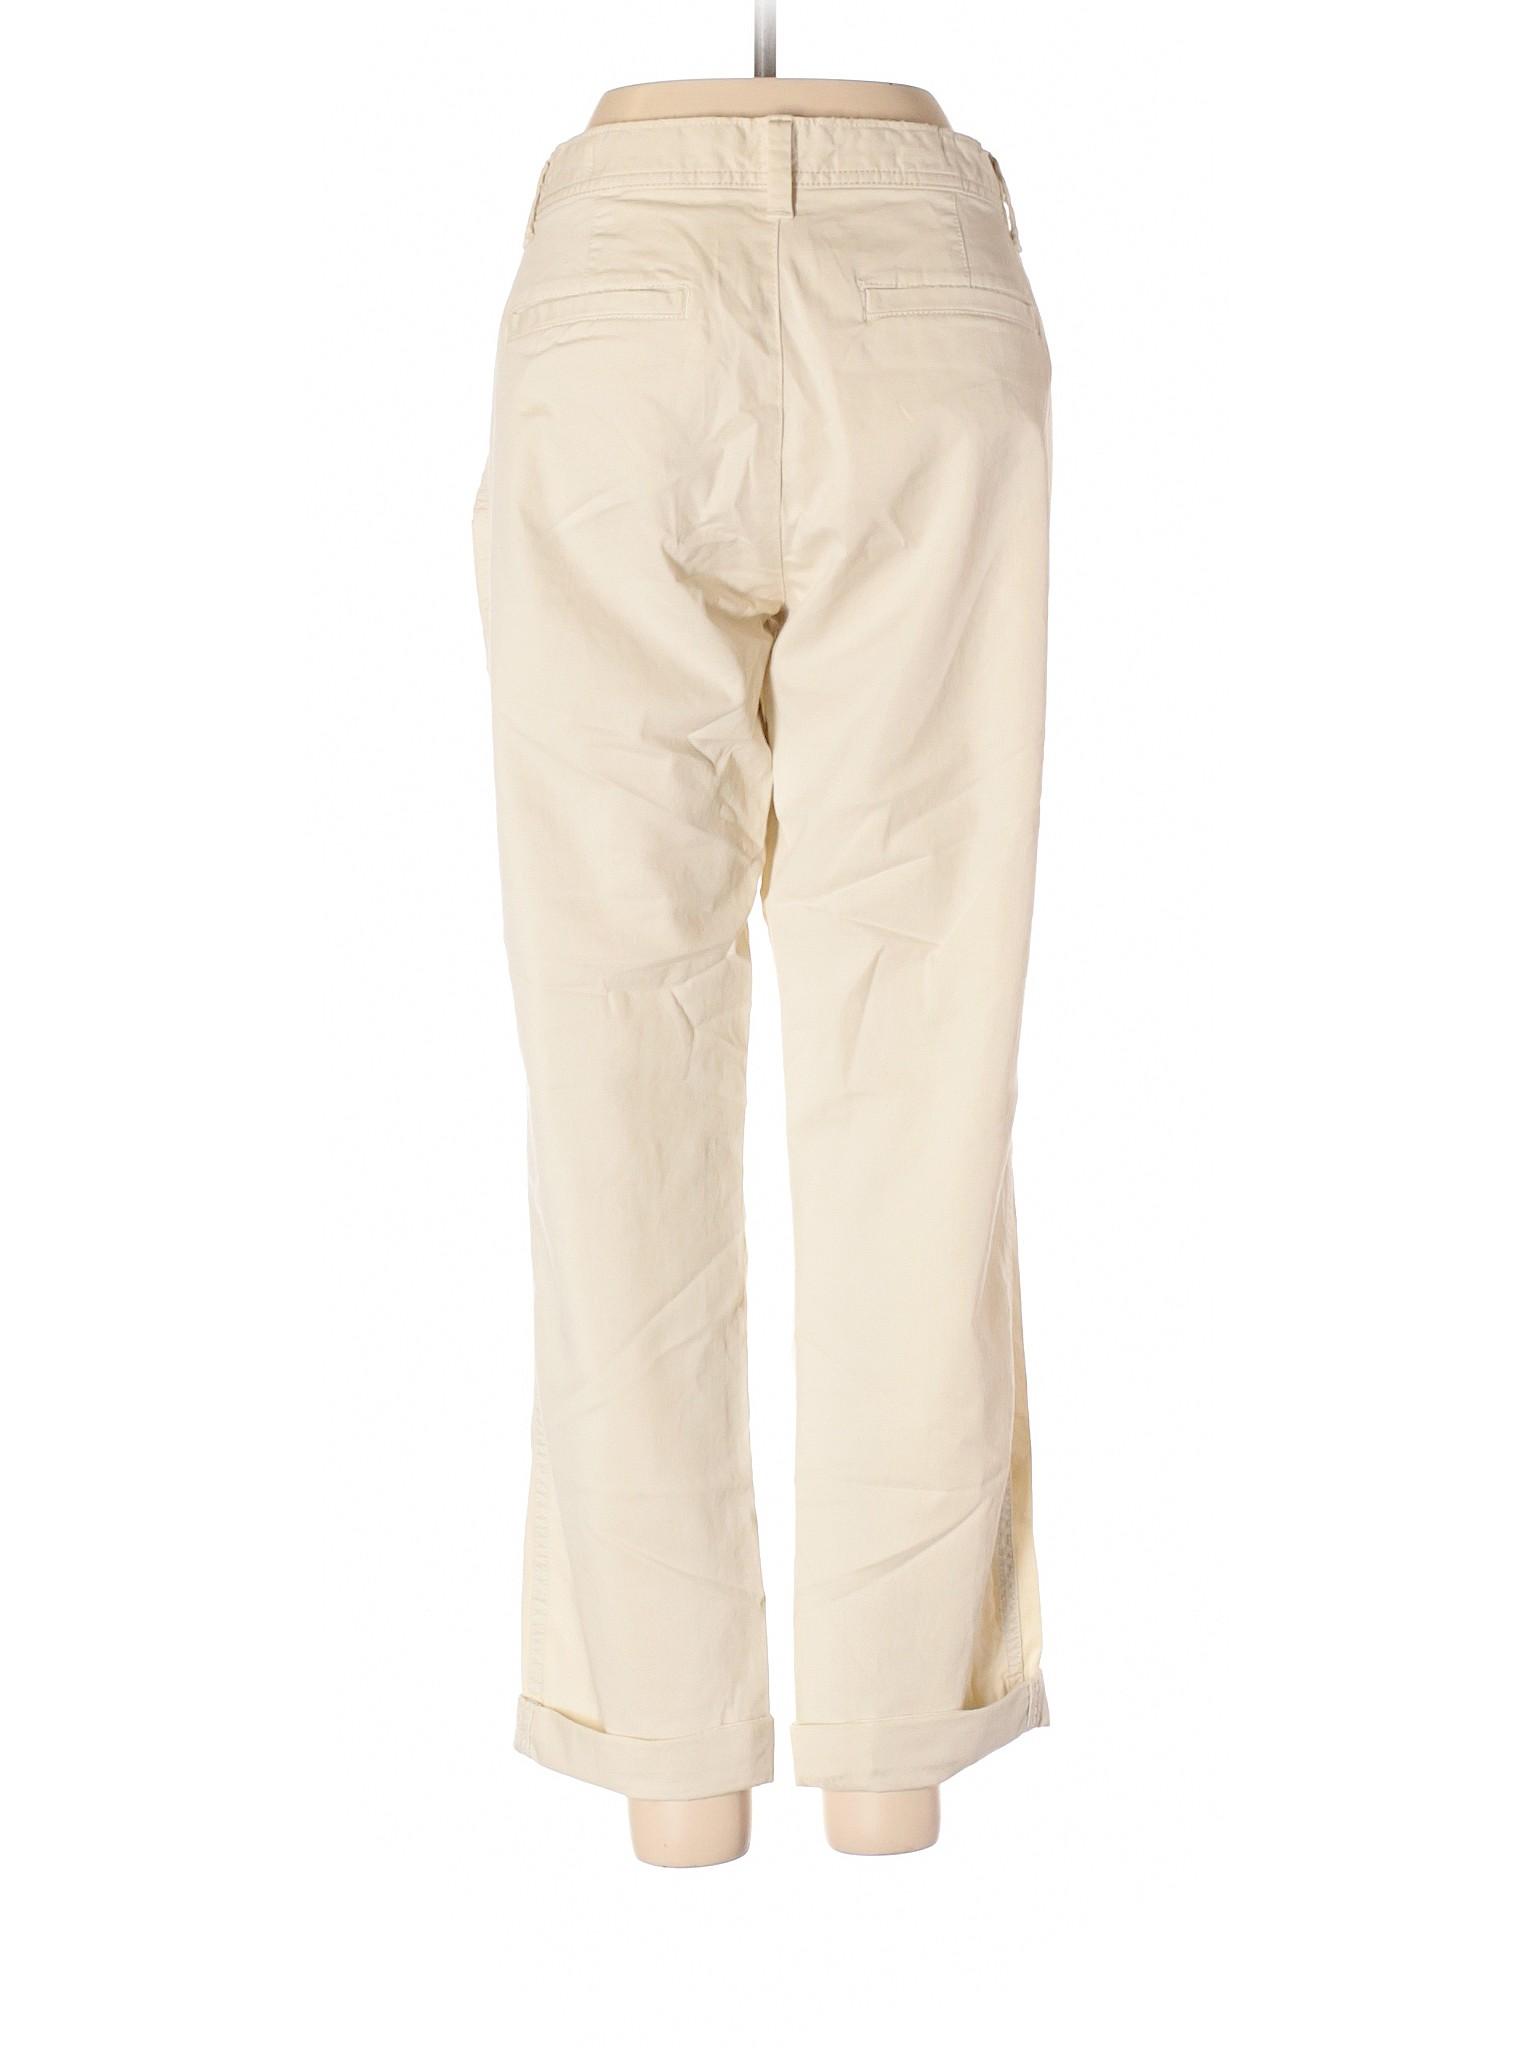 Pants Gap Boutique leisure Casual Casual Boutique leisure Boutique Pants leisure Gap AwItdAqU